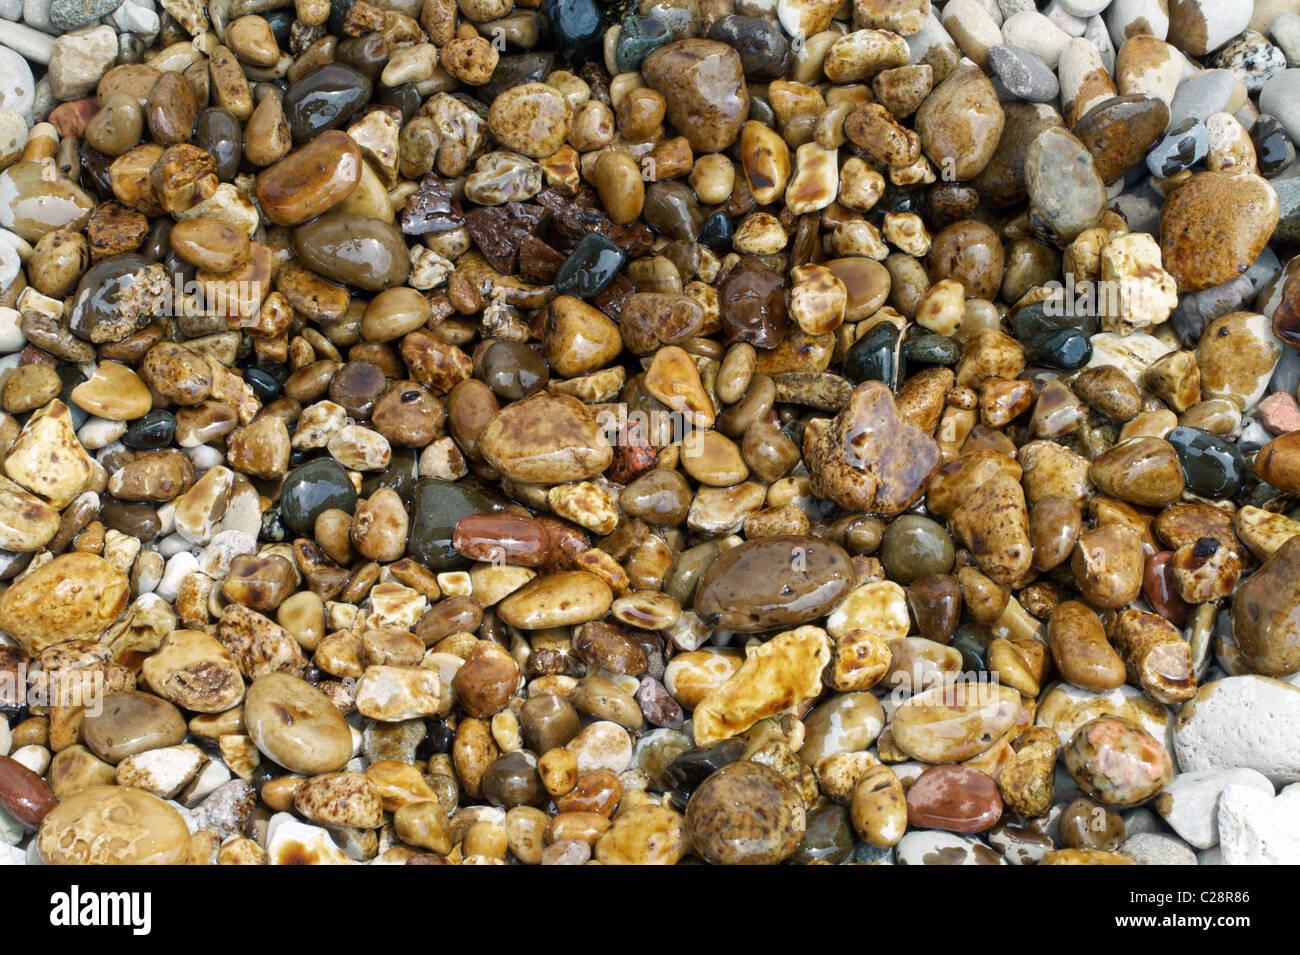 Oil spill on the rocks - Stock Image